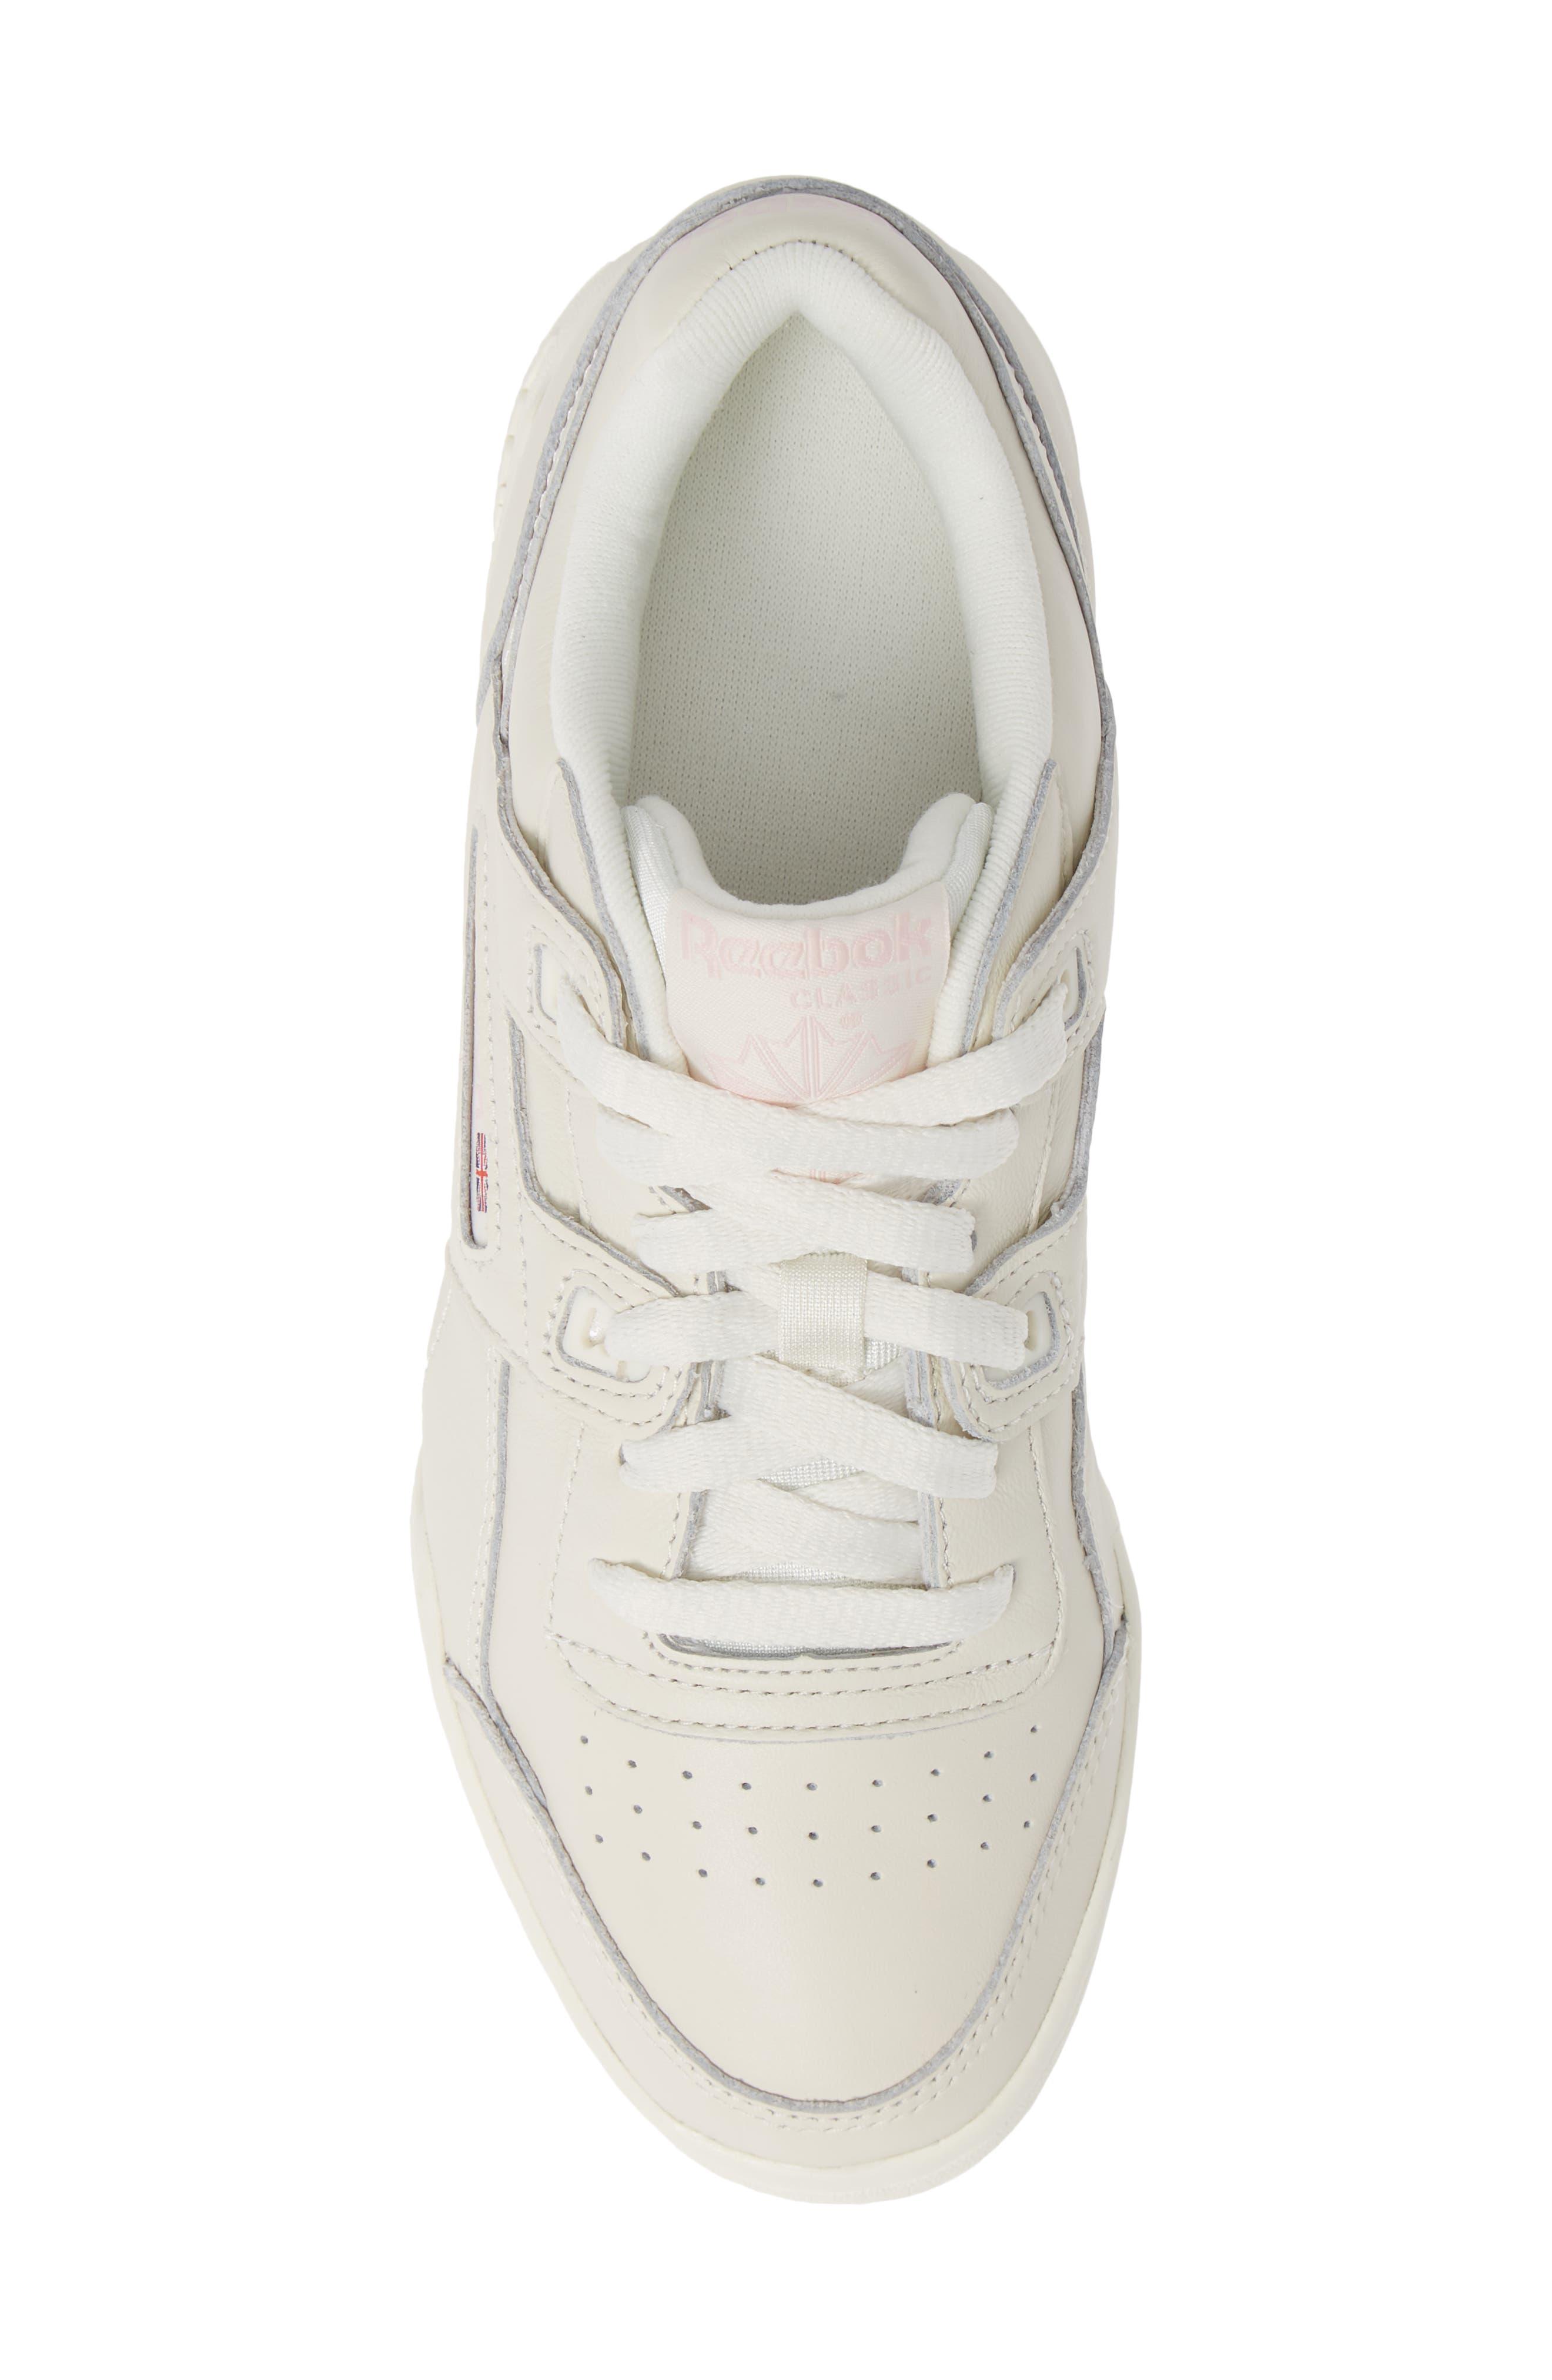 Workout Low Plus Sneaker,                             Alternate thumbnail 5, color,                             WHITE/ PRACTICAL PINK